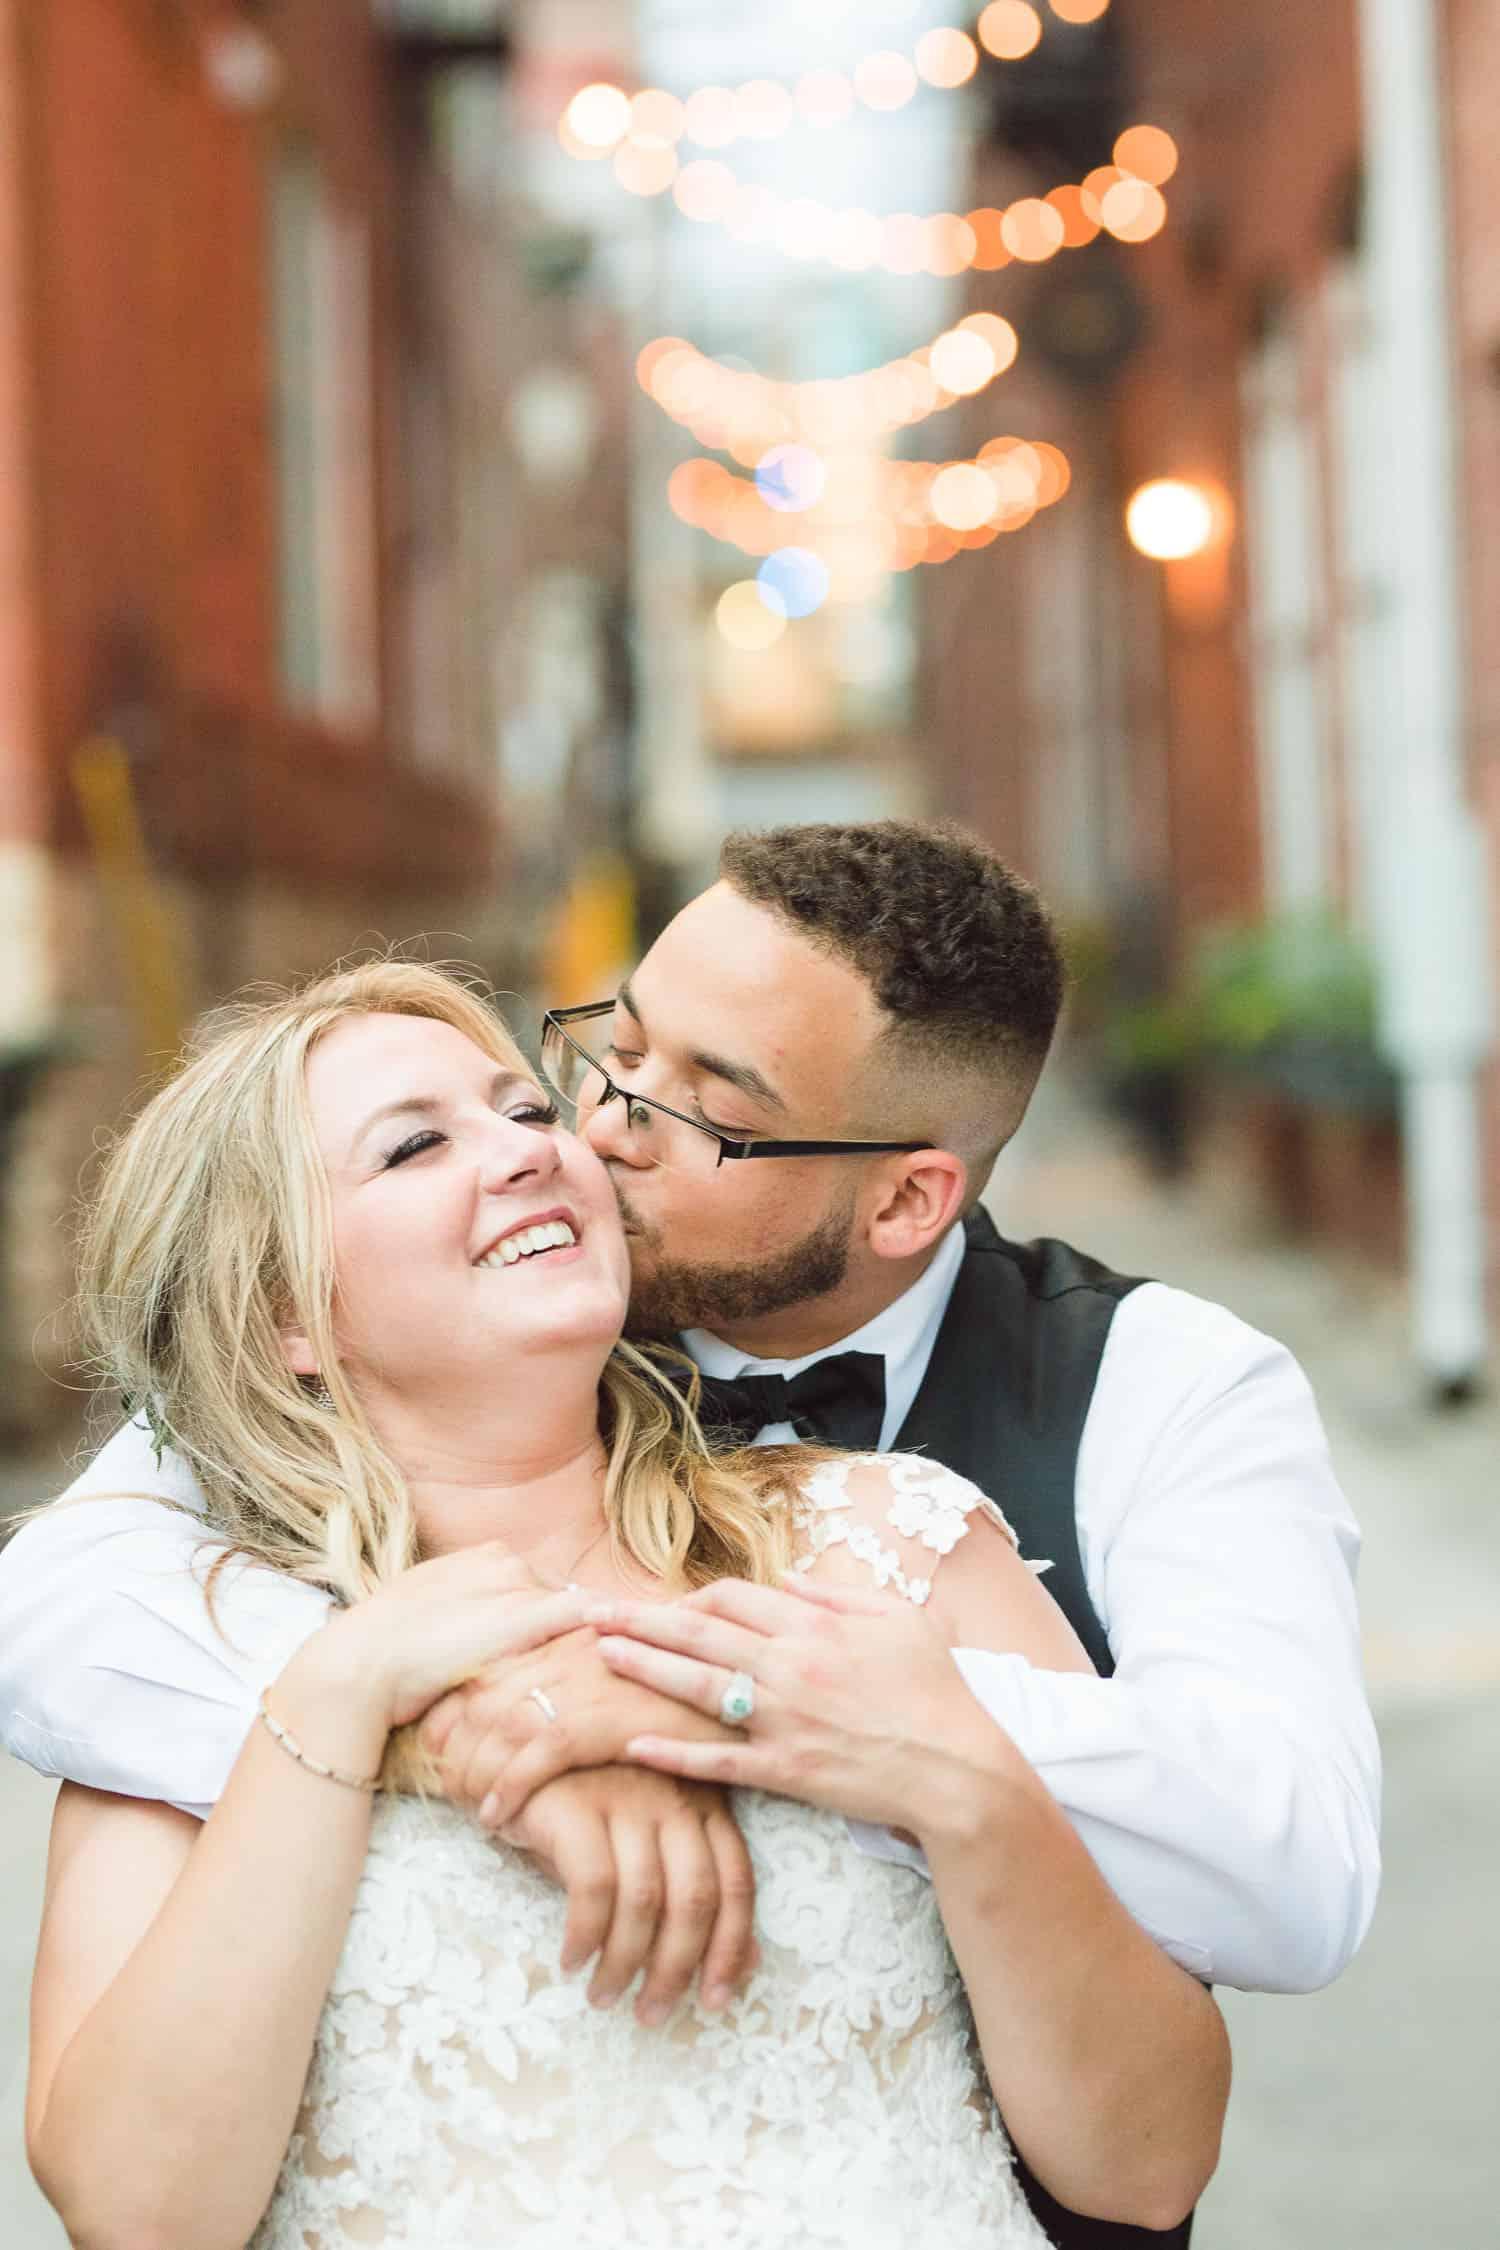 Crossroads wedding portraits in Kansas City